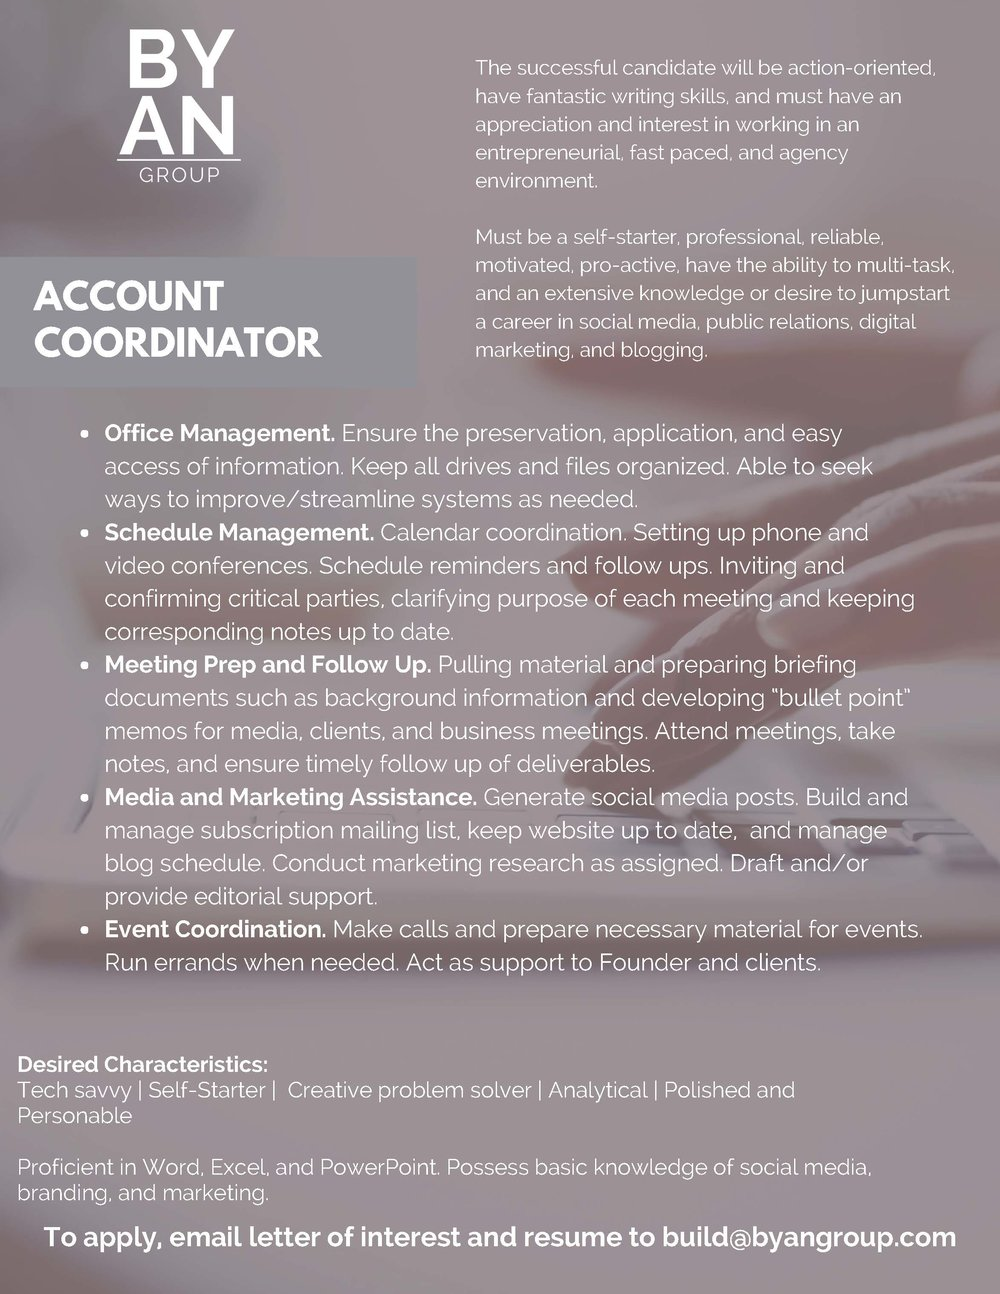 Account Coordinator Job Posting.jpg